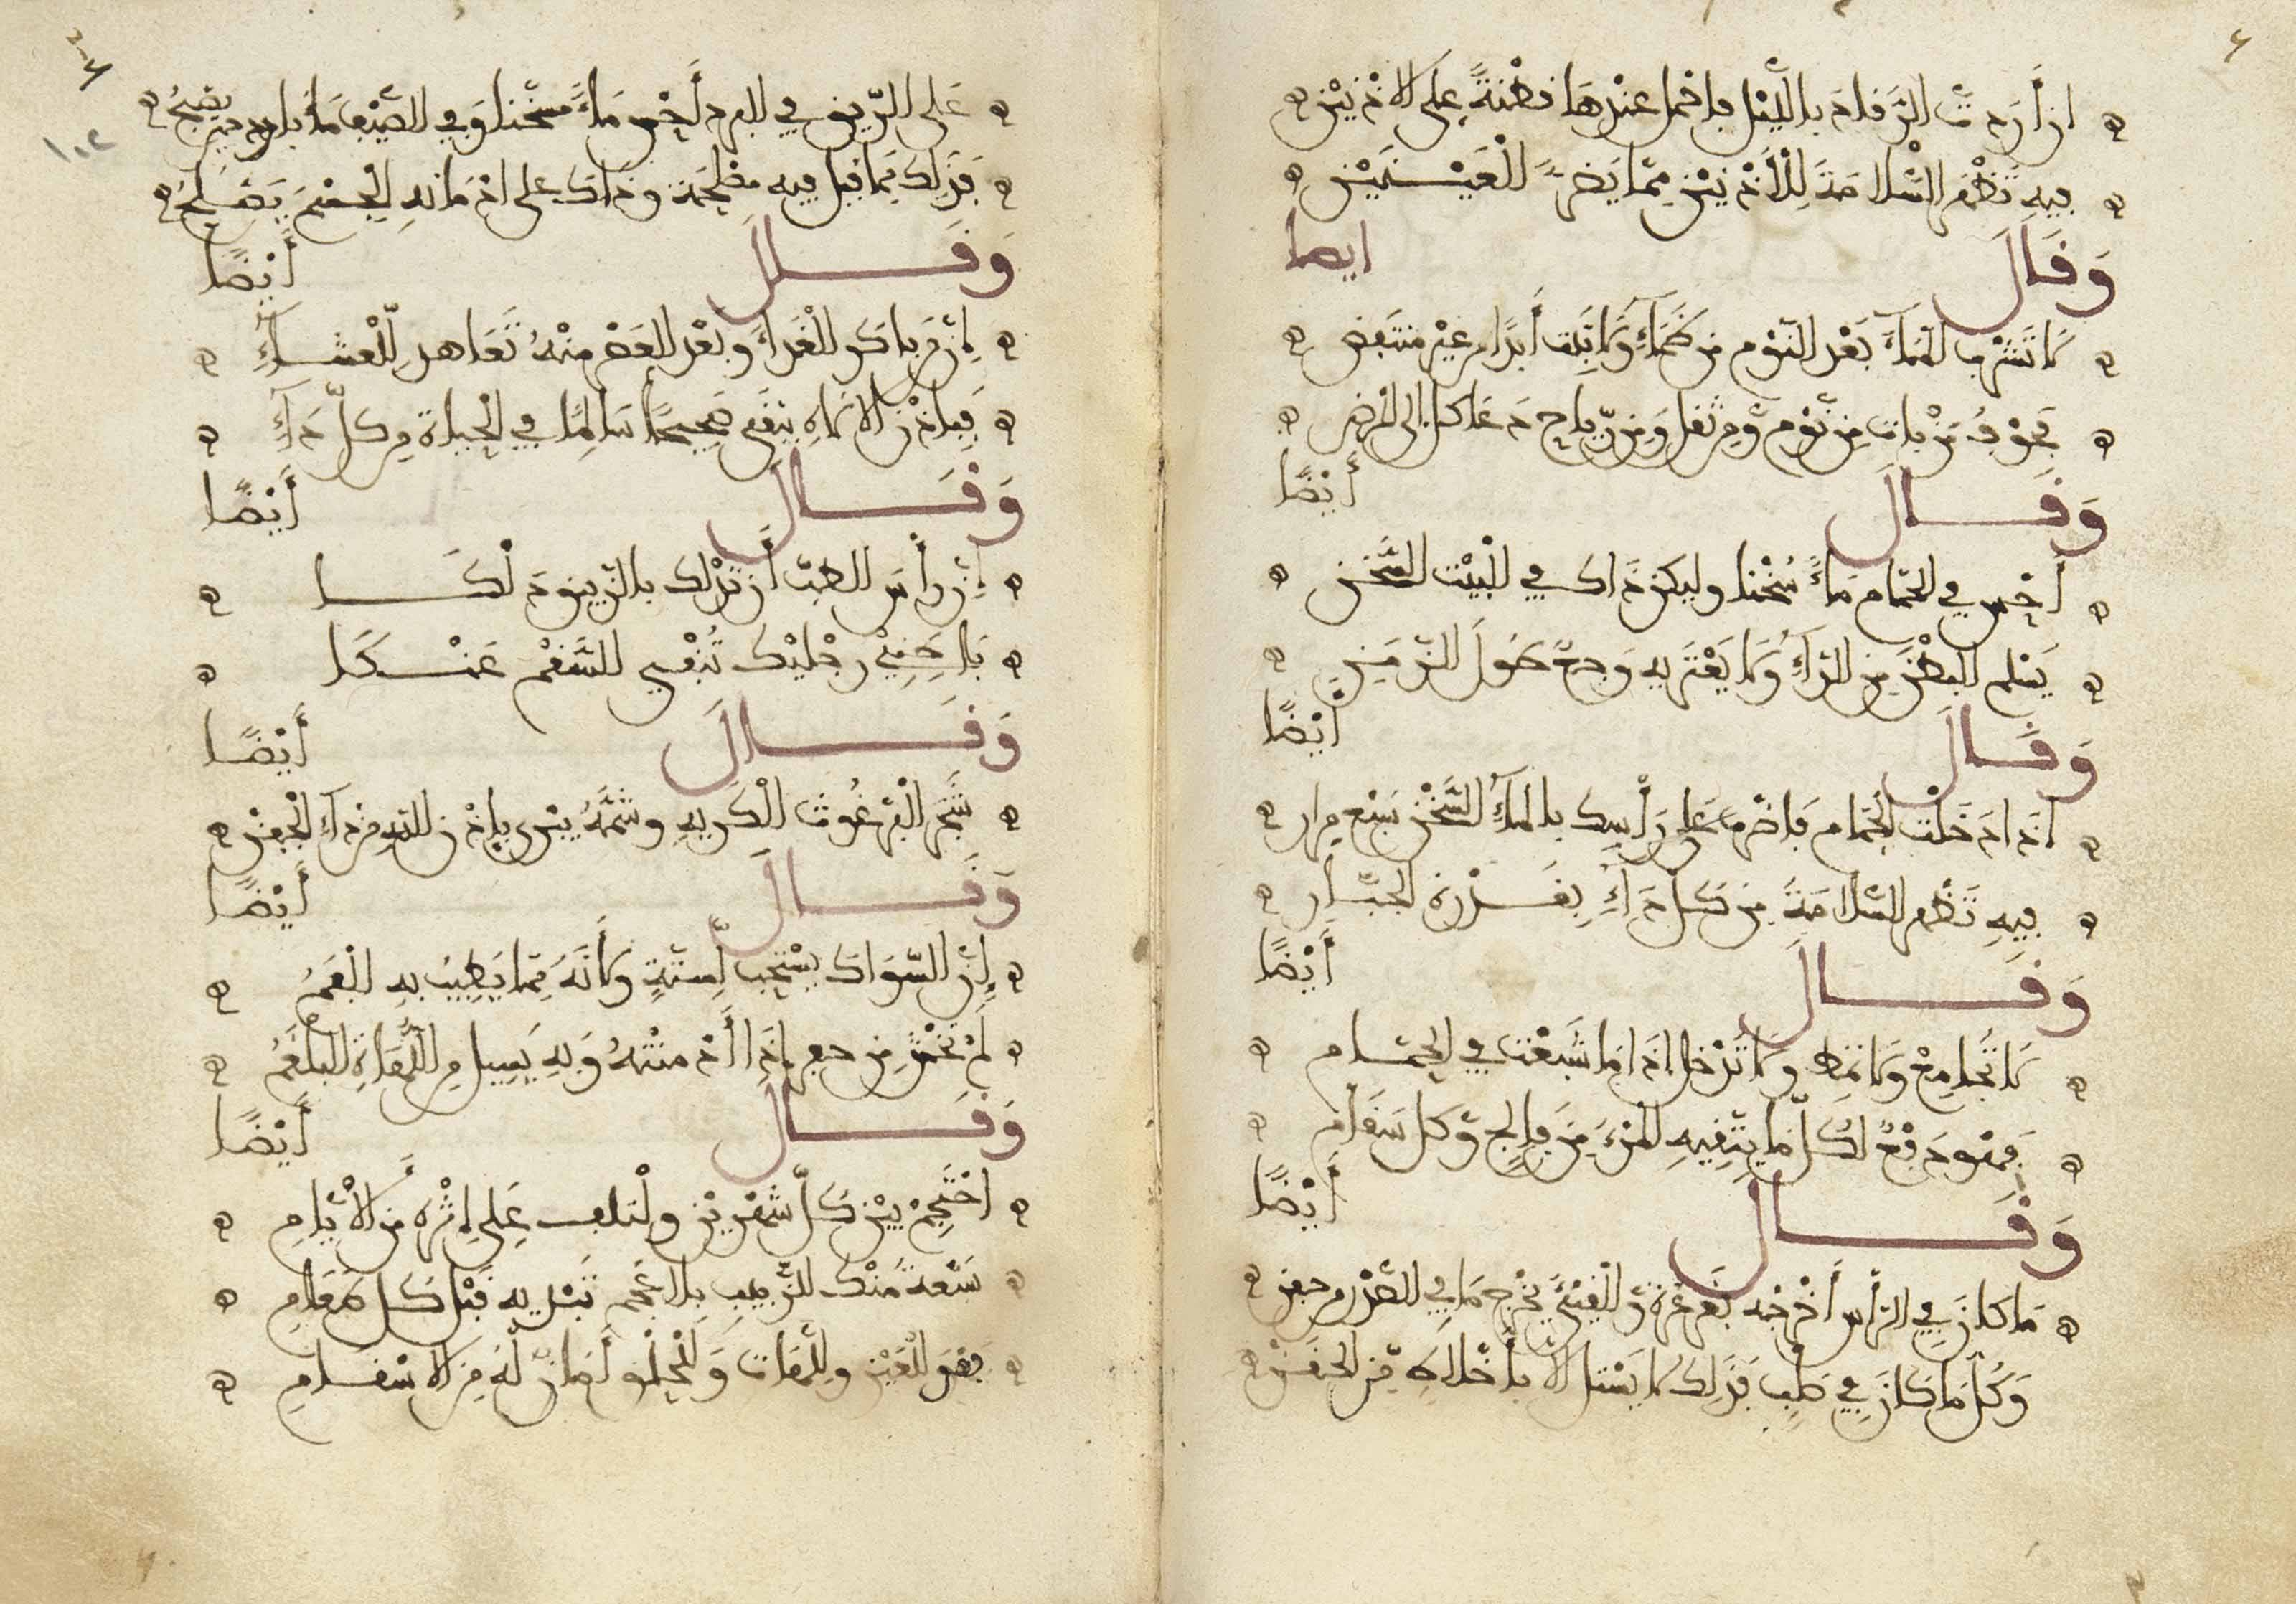 MUHAMMAD BIN SA'DUN BIN 'ALI BIN BILAL AL-QARAWANI (D.486 AD): KITAB AL-MIFTAH WA IRTIYAH AL-ARWAH